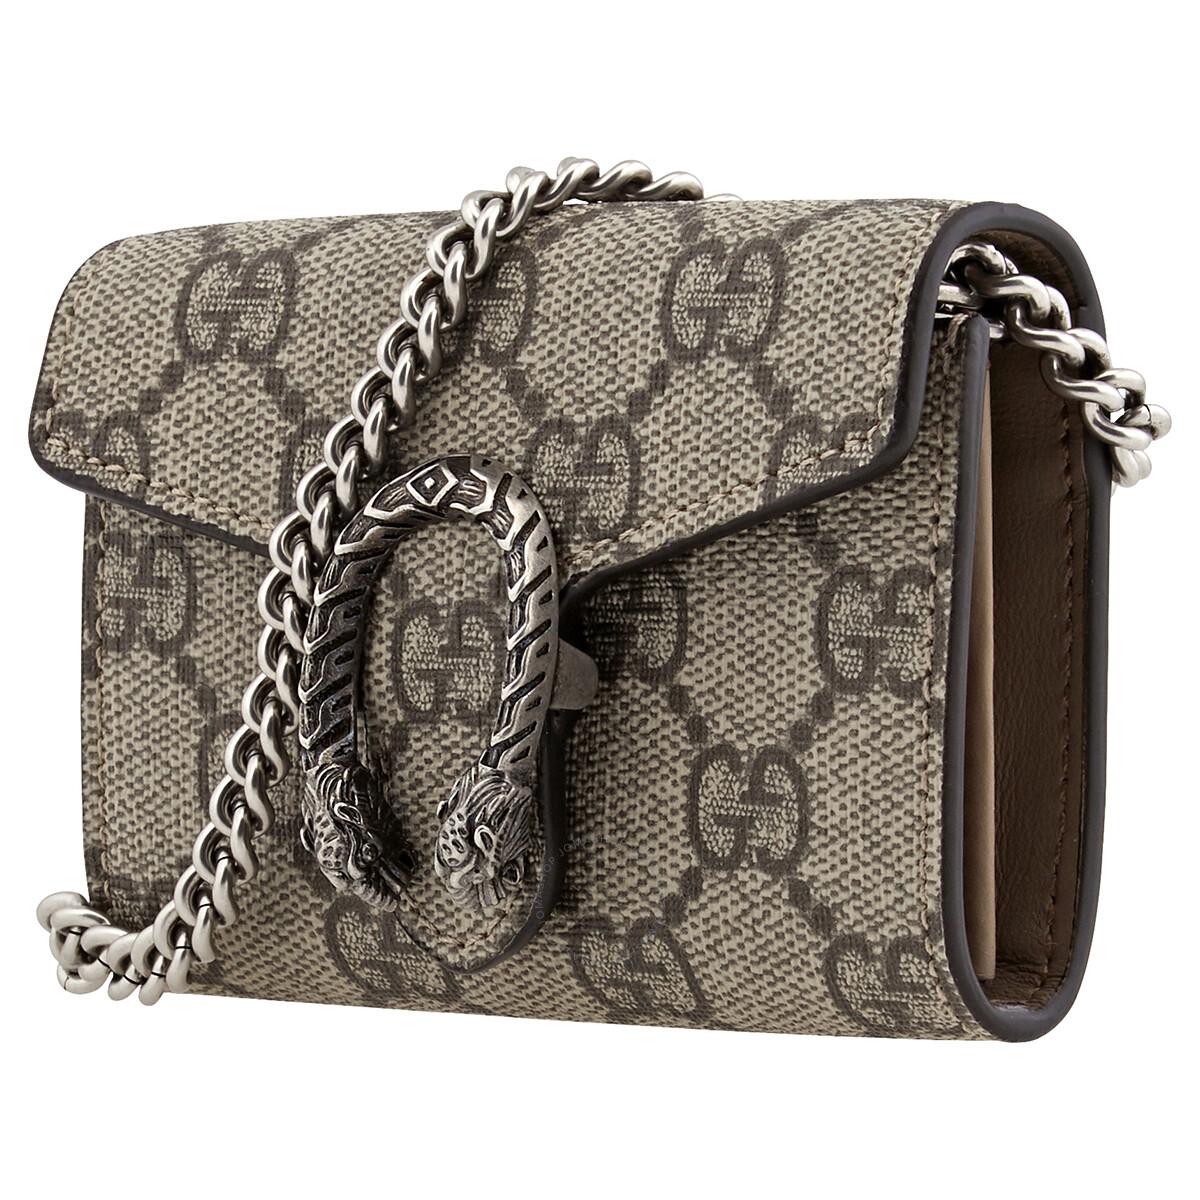 dionysus coin purse